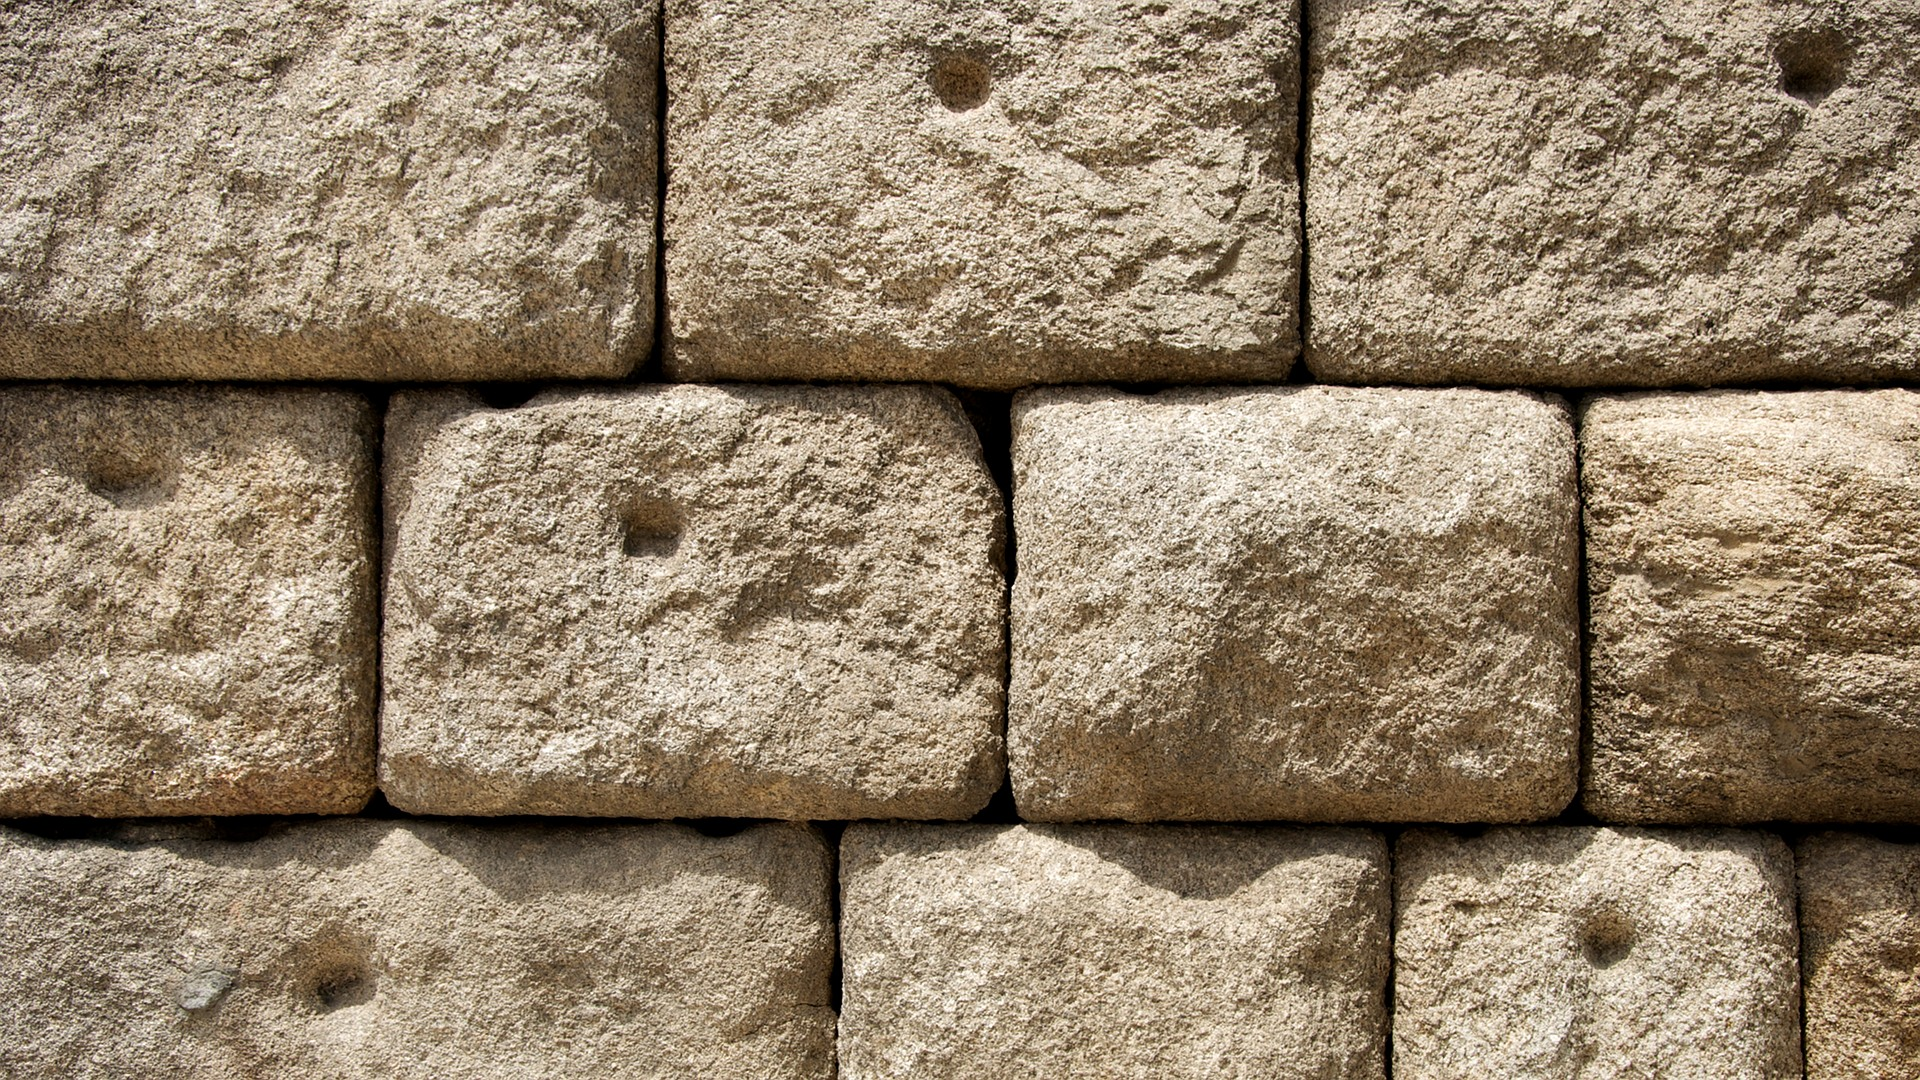 Sillar wikipedia la enciclopedia libre for Piedra de silleria